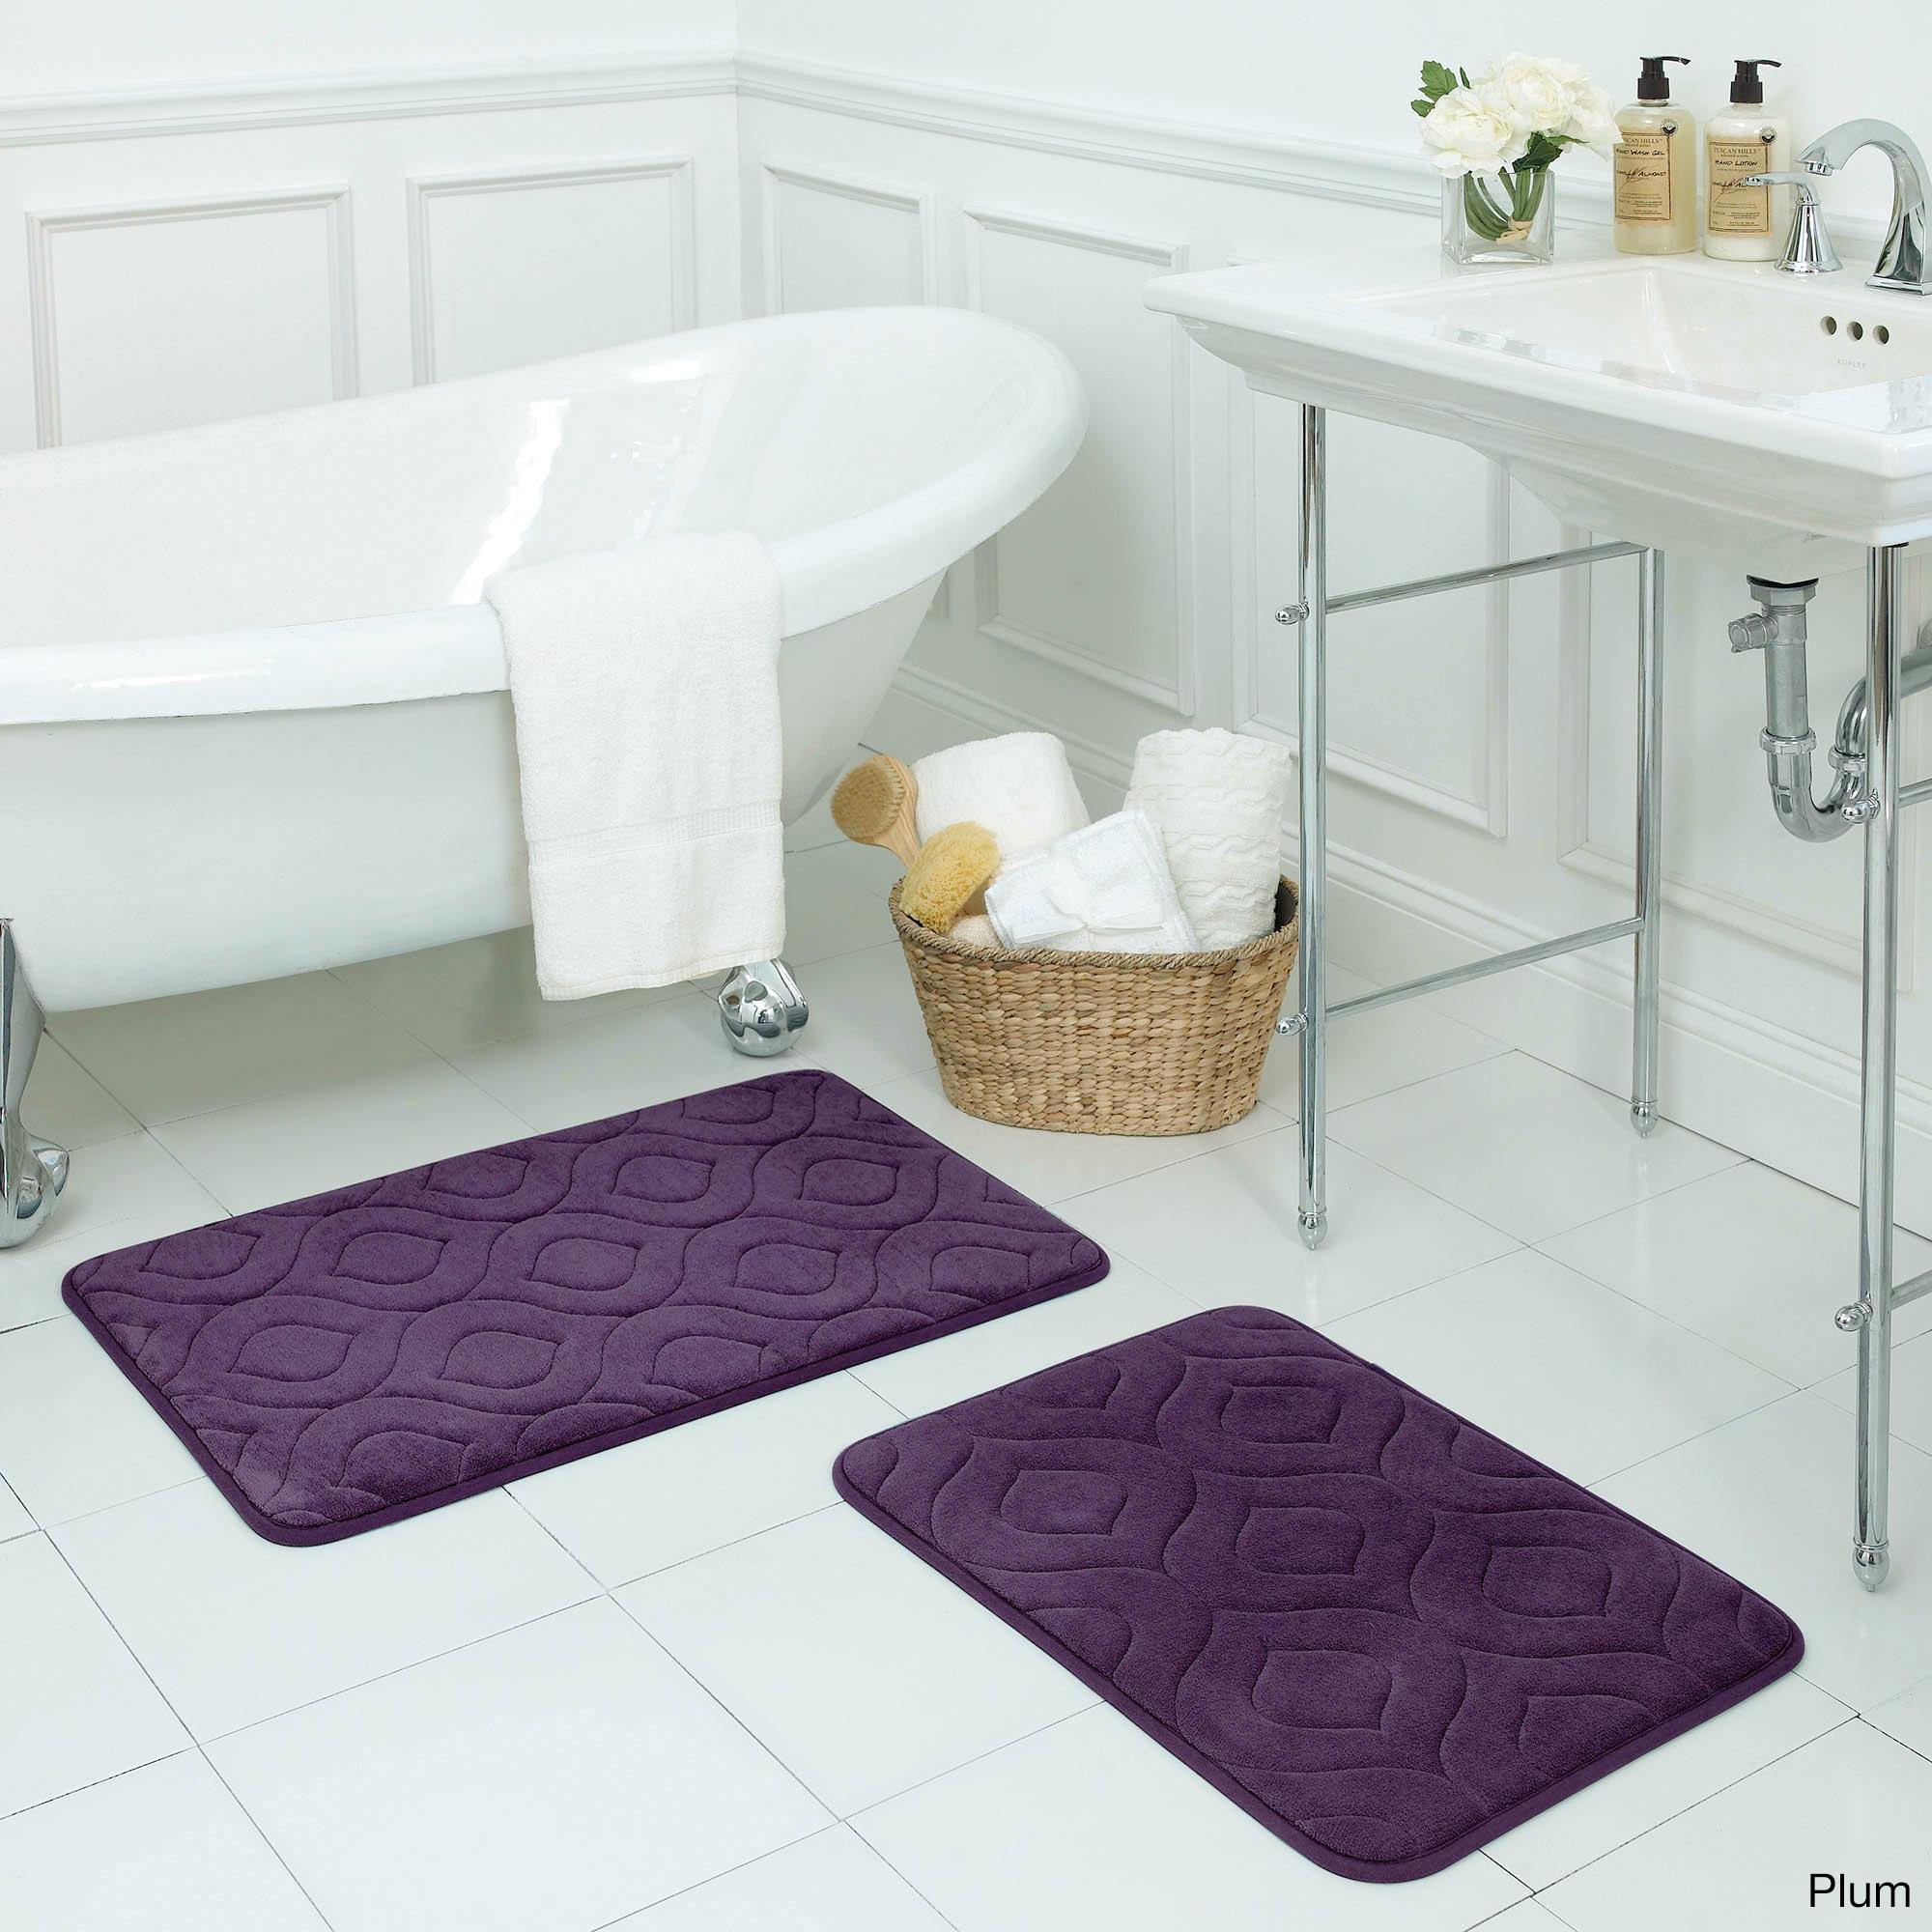 Purple Bath Rugs & Bath Mats | Find Great Bath & Towels Deals ...